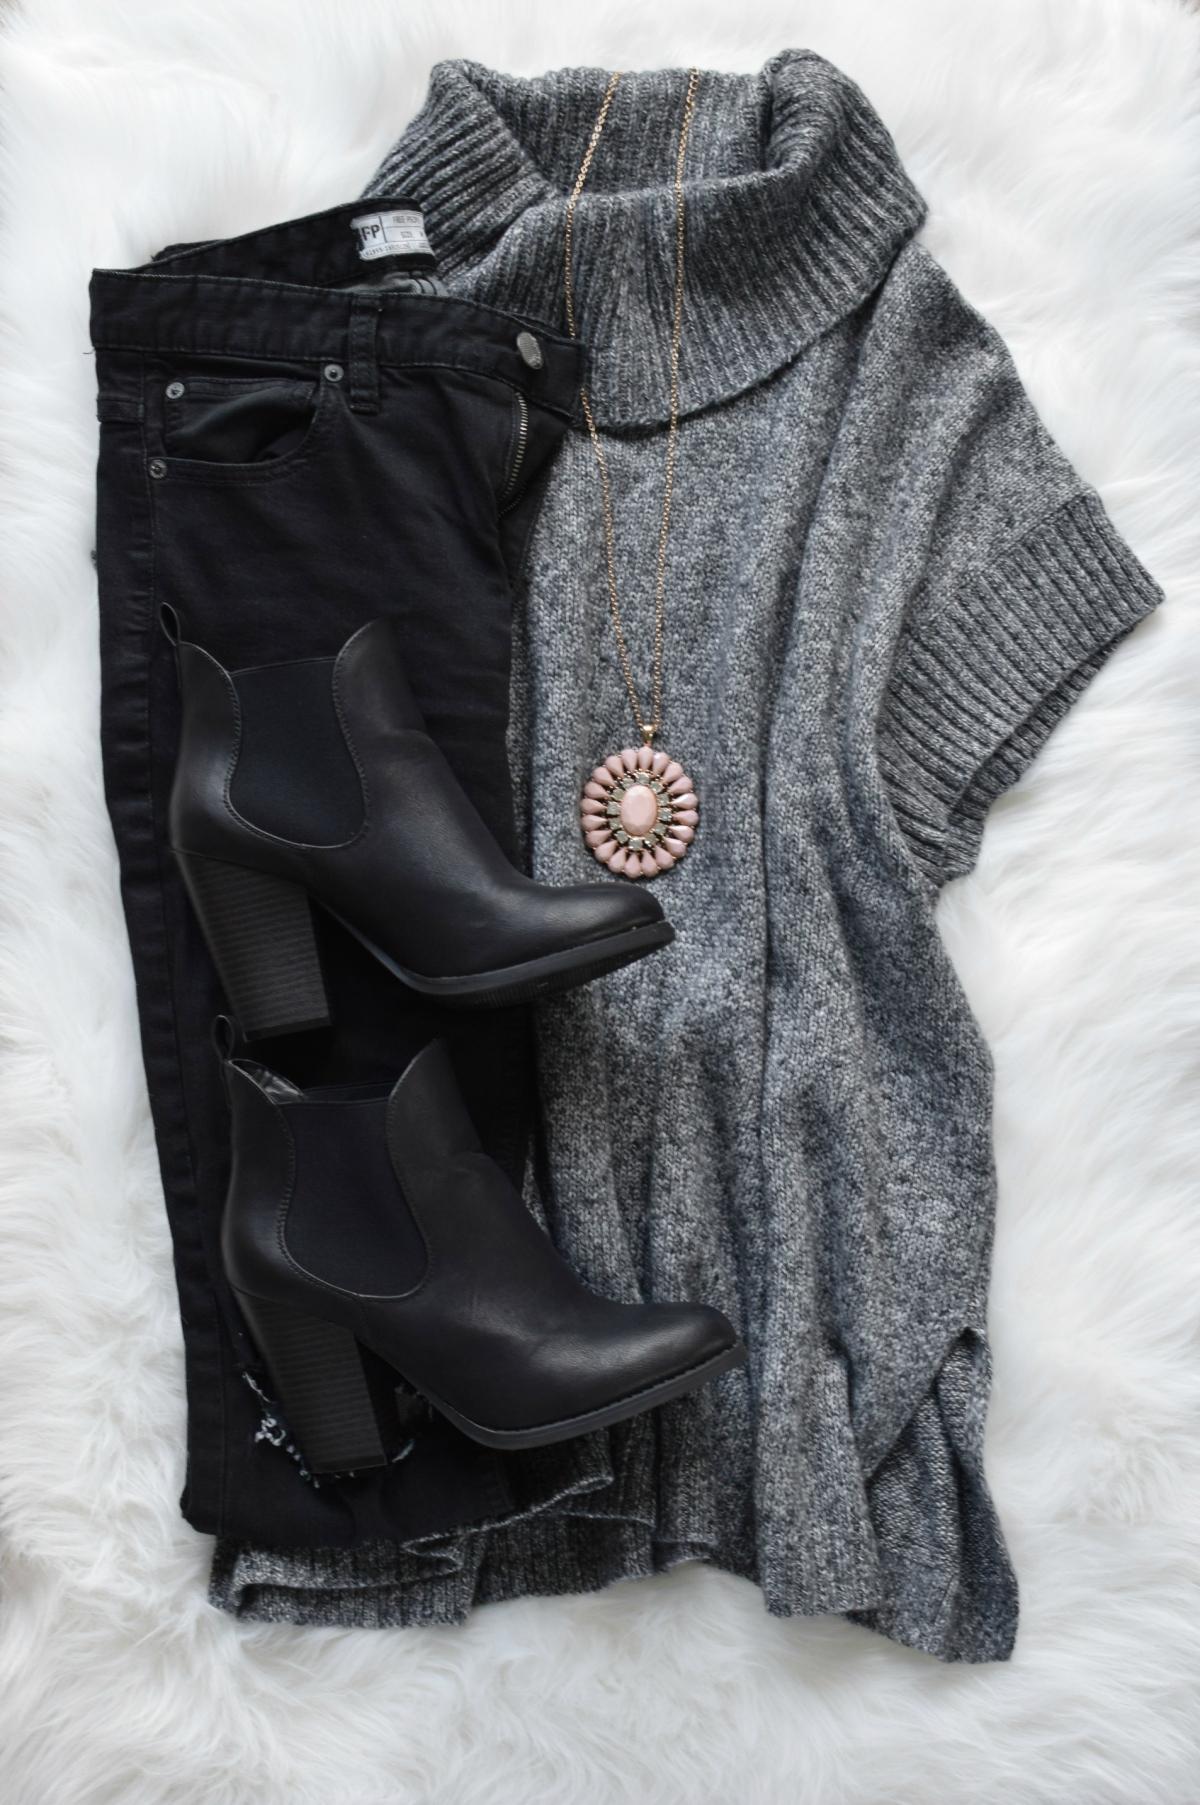 Turtleneck cape sweater, distressed black denim, ankle booties, and pops of blush |www.pearlsandsportsbras.com|